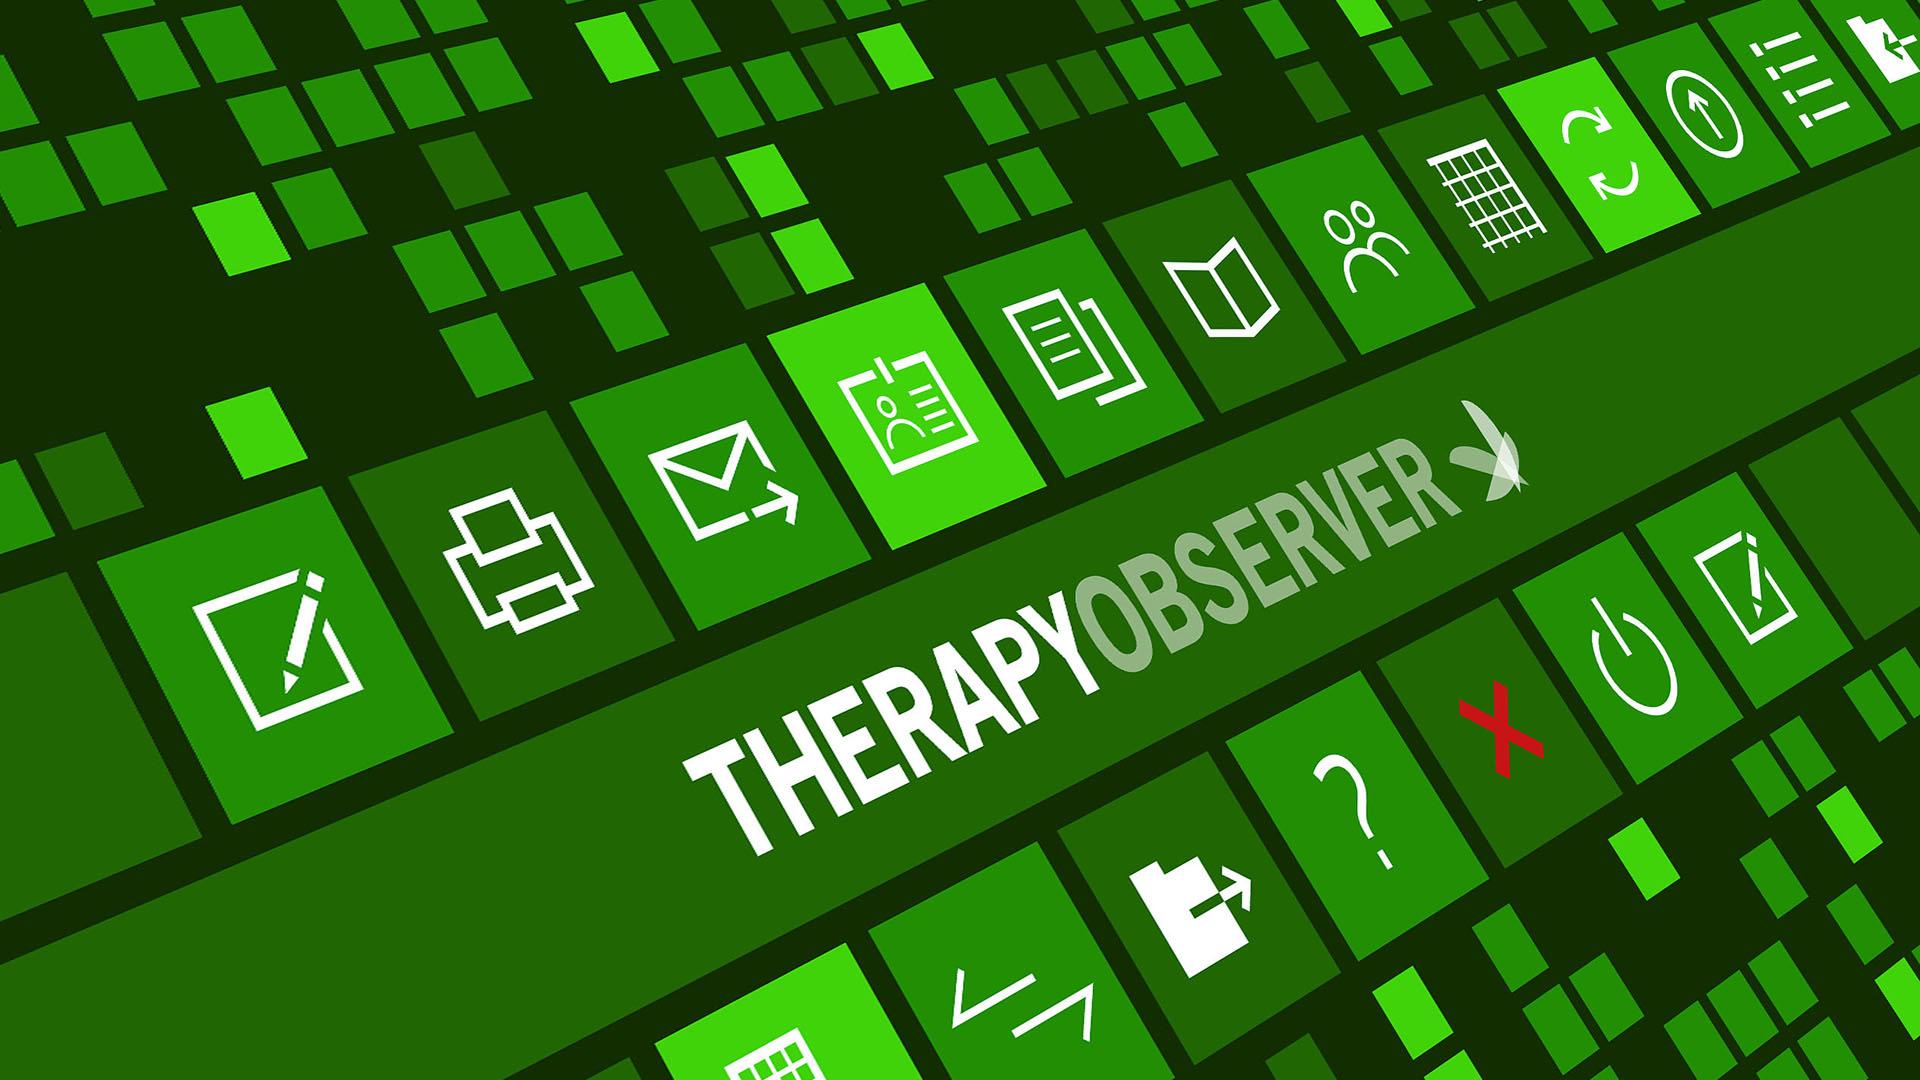 Beste Psychotherapie Praxissoftware